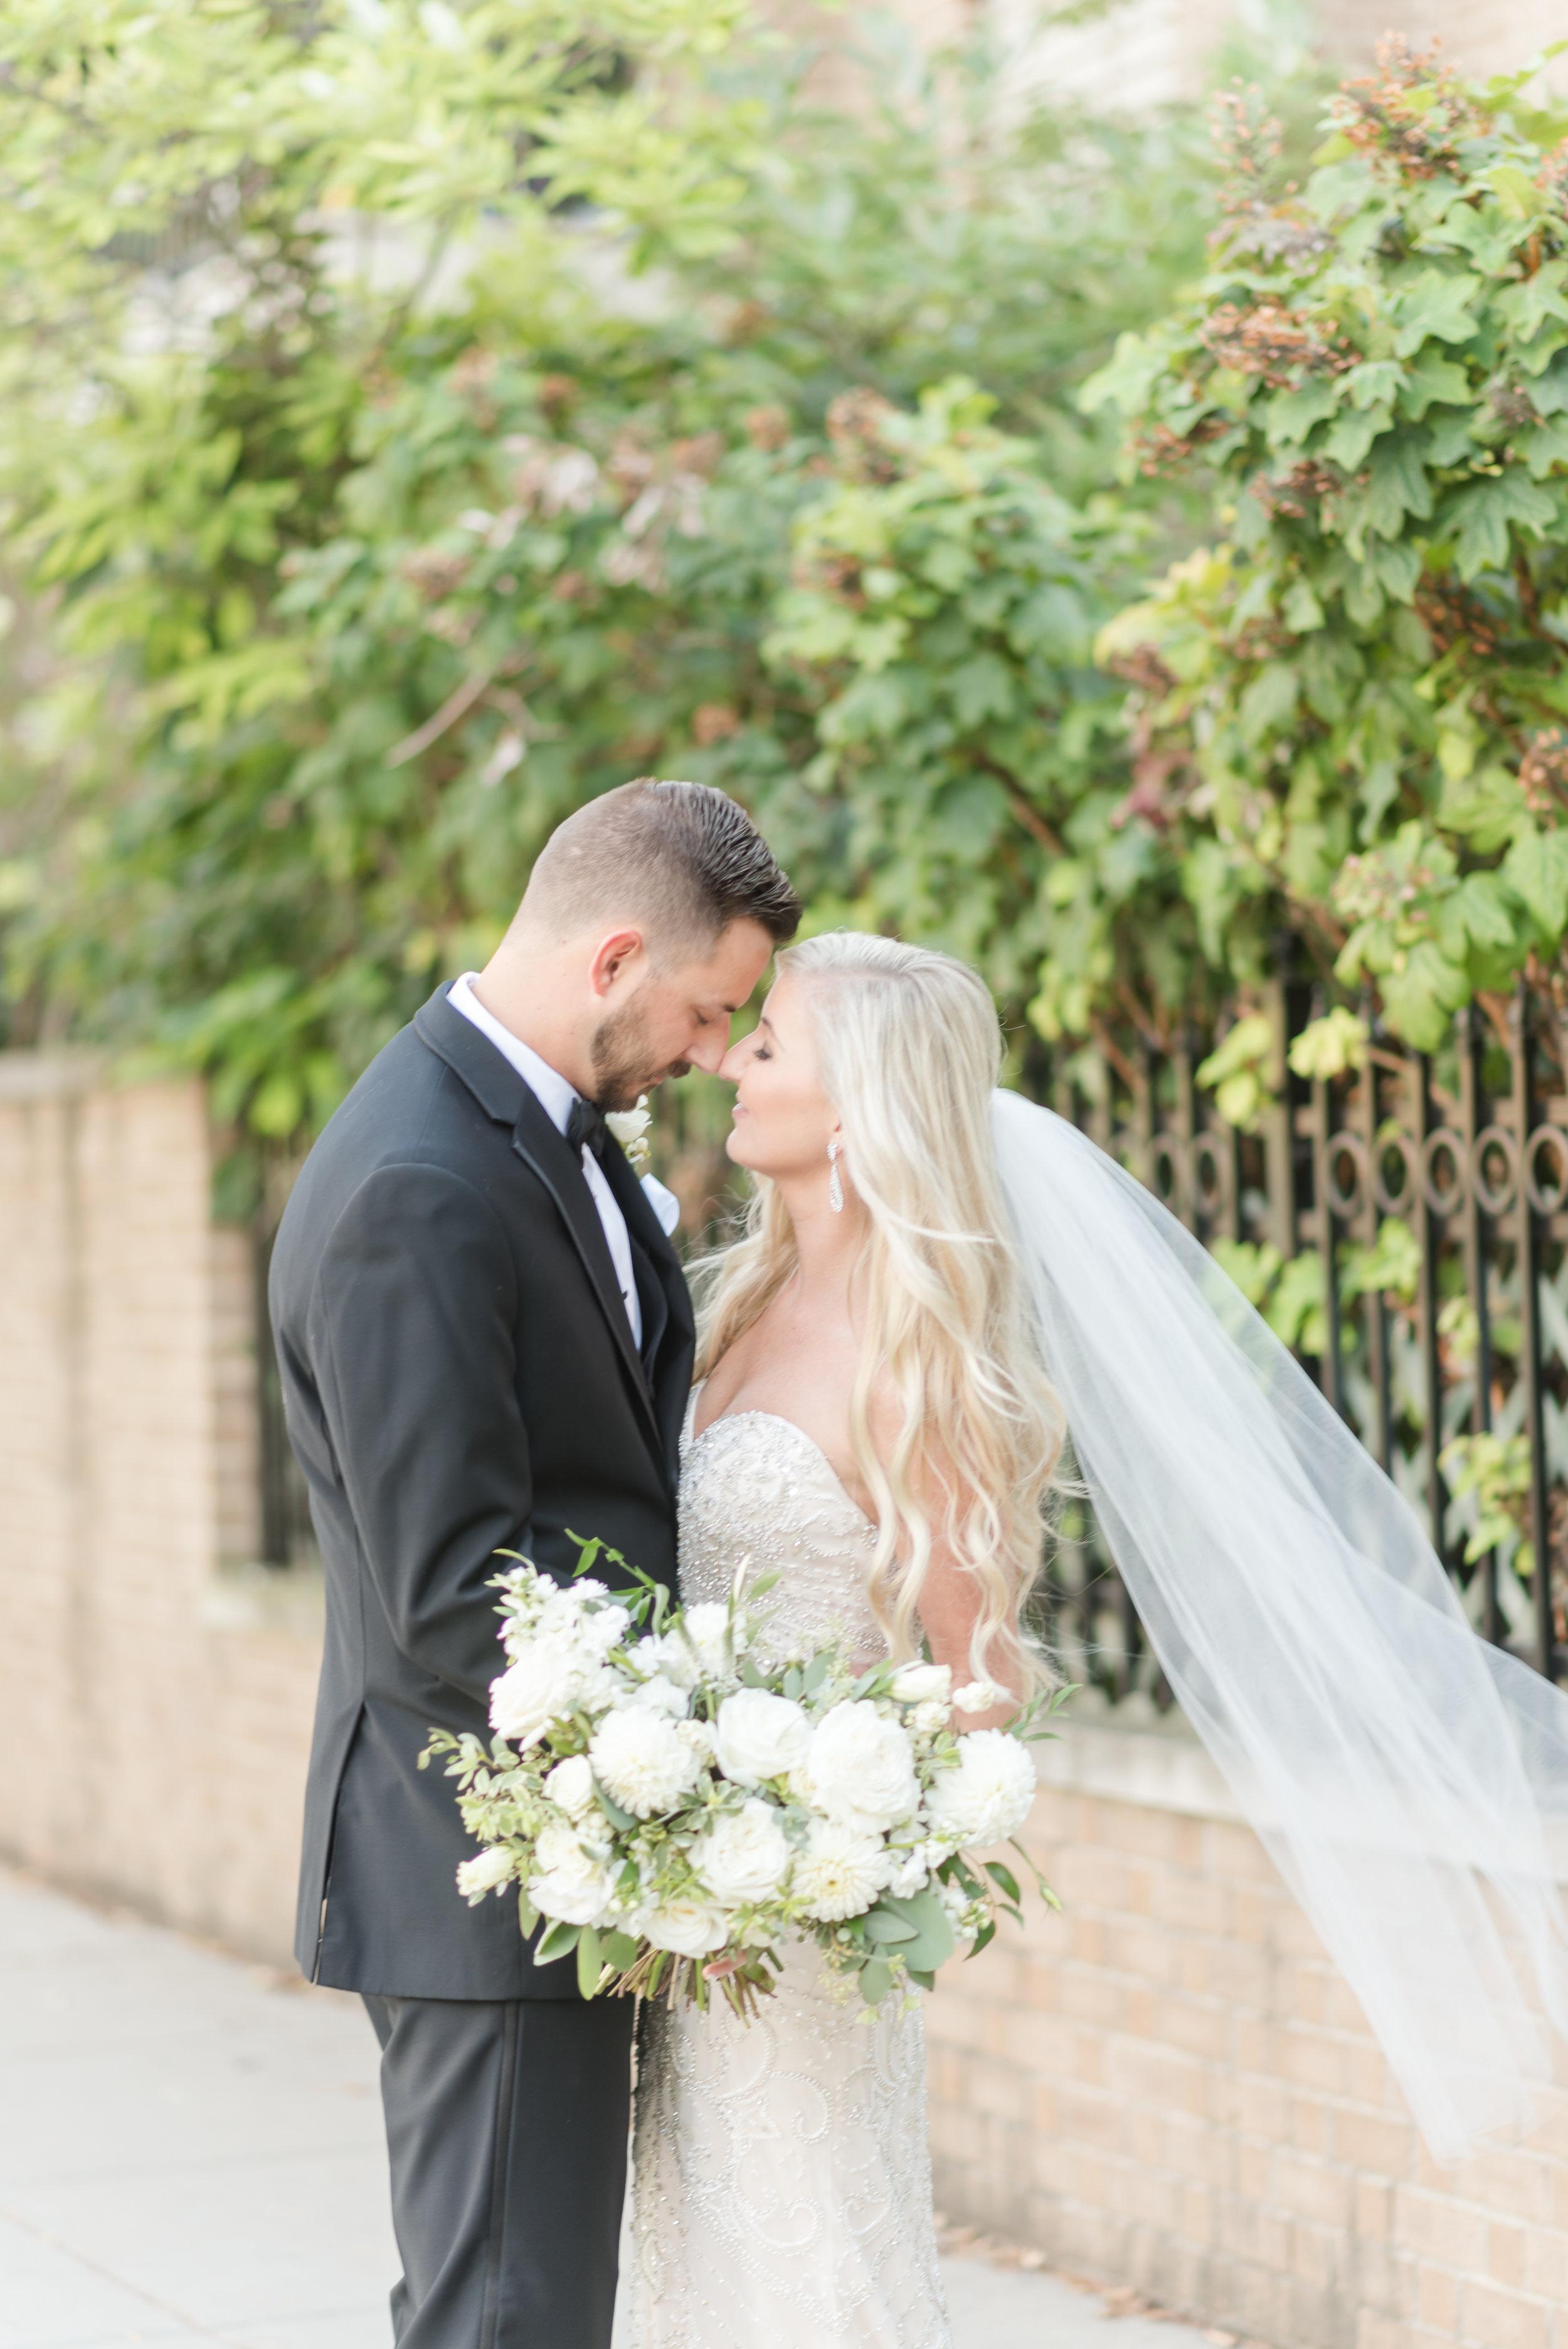 Indianapolis Wedding Photographers Wedding Day Timeline Bride and Groom Photos